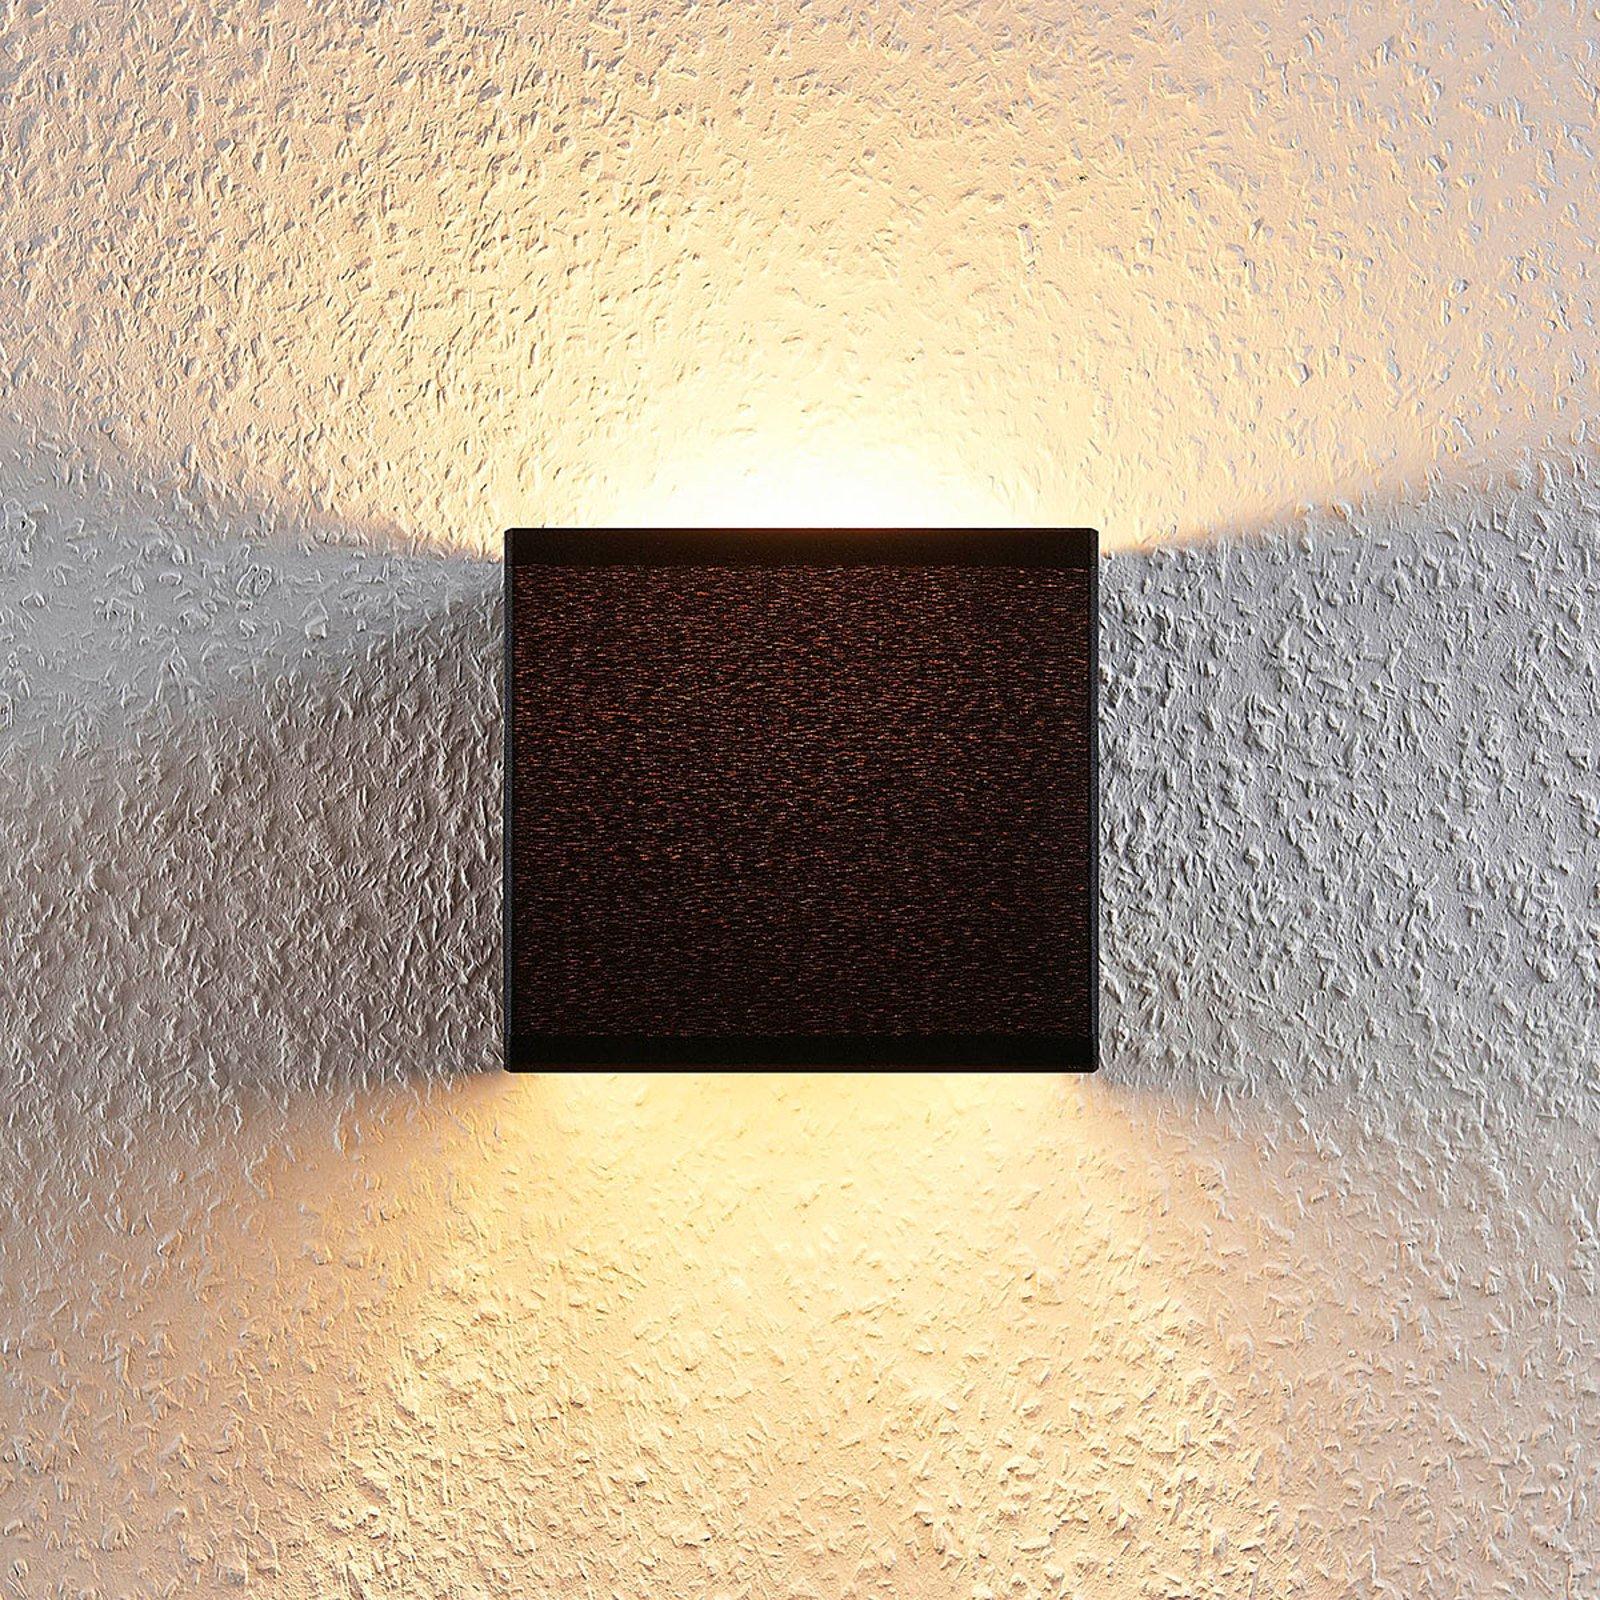 Adea stoff-vegglampe med bryter, 13 cm, svart